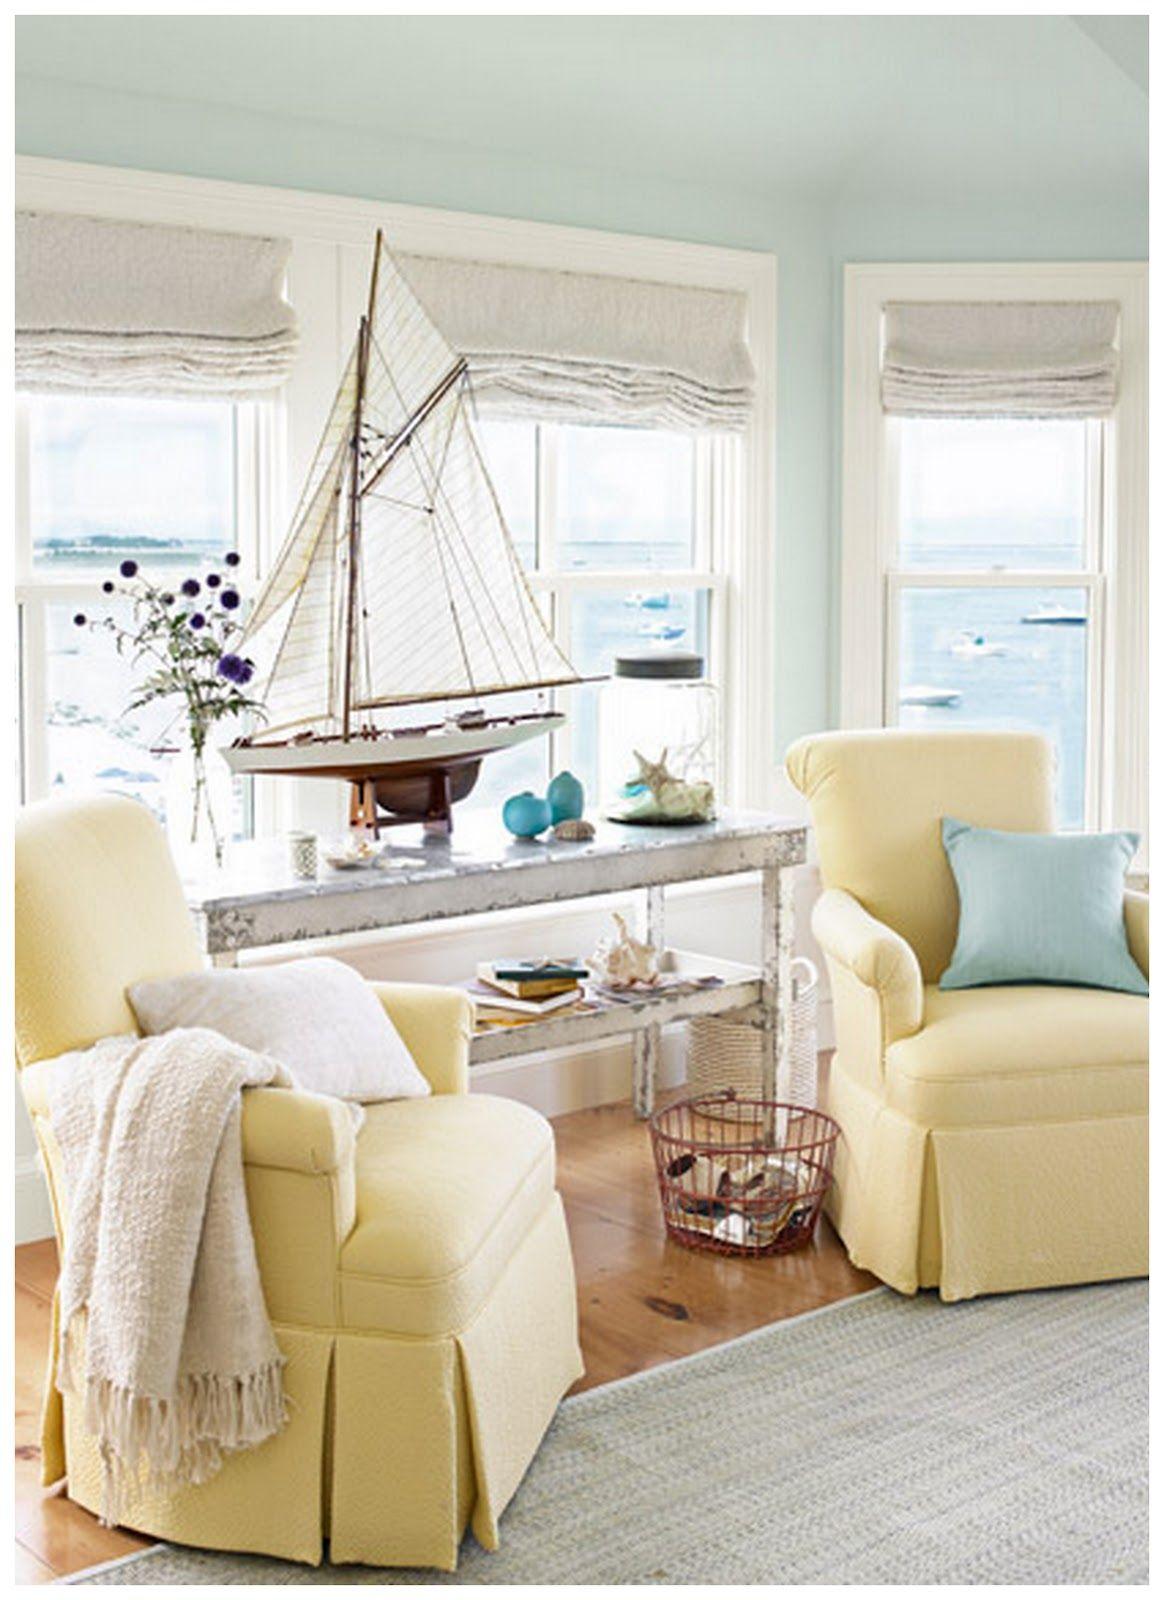 41 Easy Breezy Beach House Decorating Ideas | Pastel interior ...